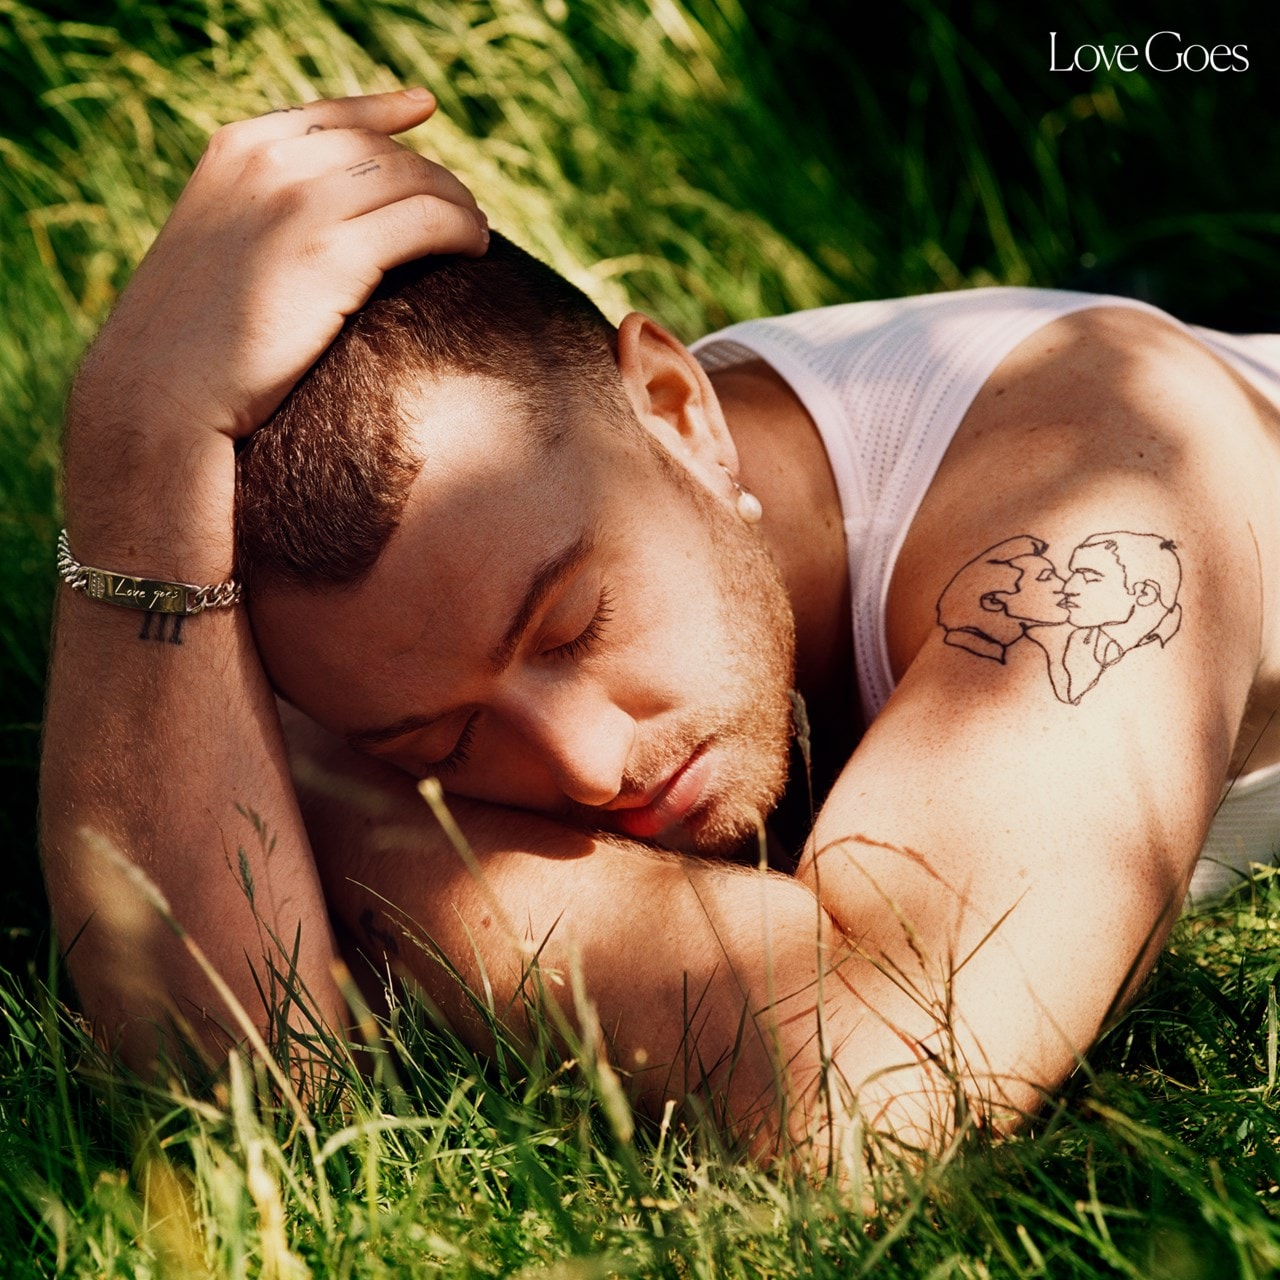 Love Goes - 1